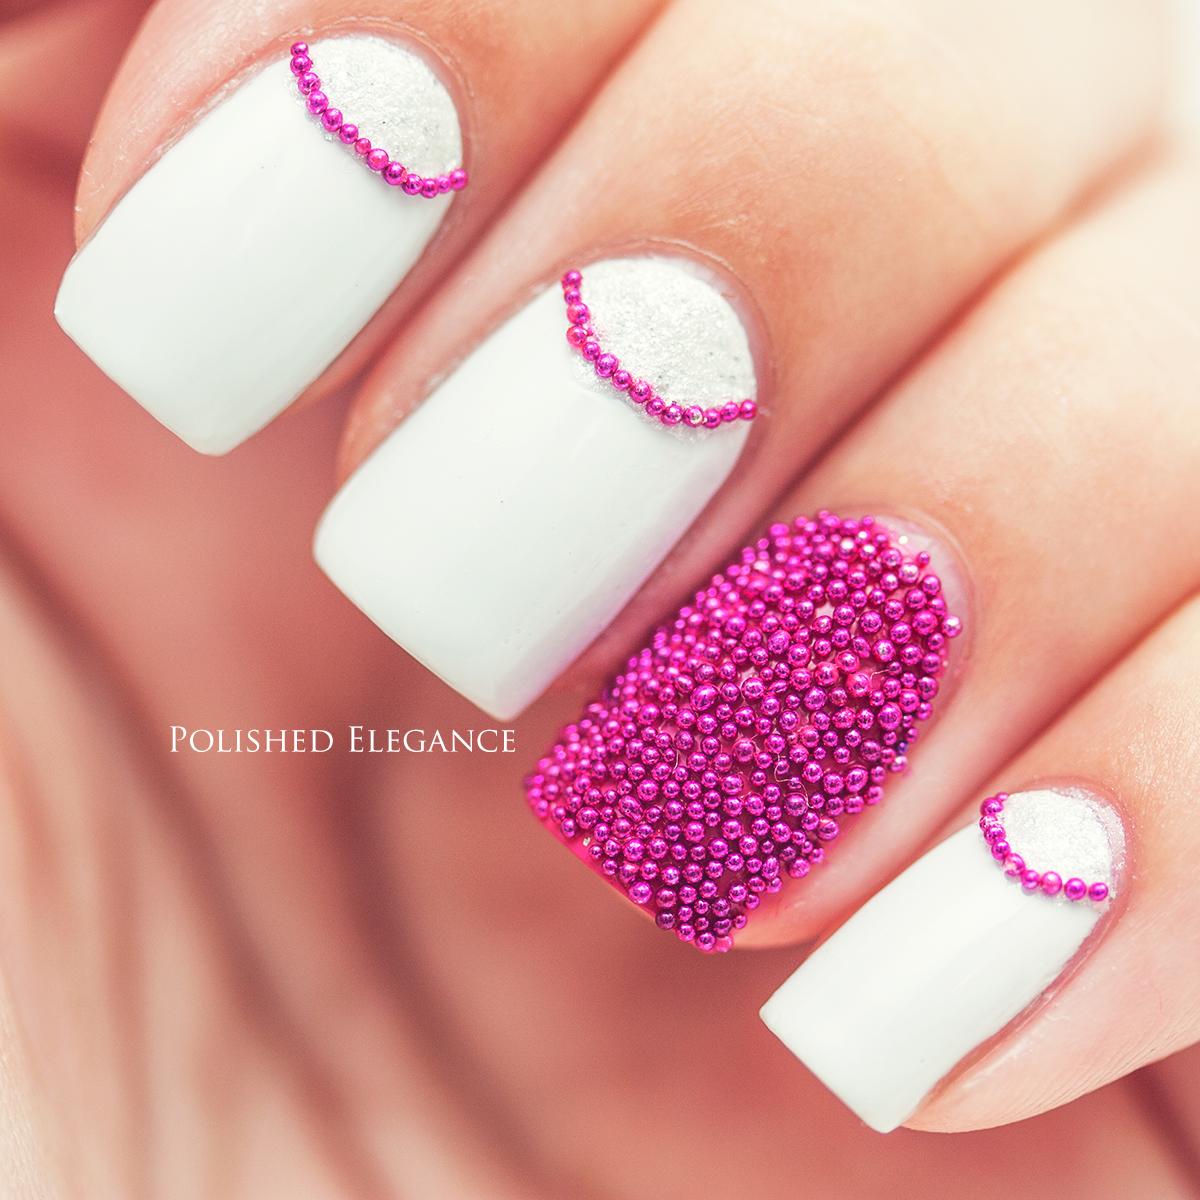 Caviar Nails: Polished Elegance: Review Of Caviar Beads